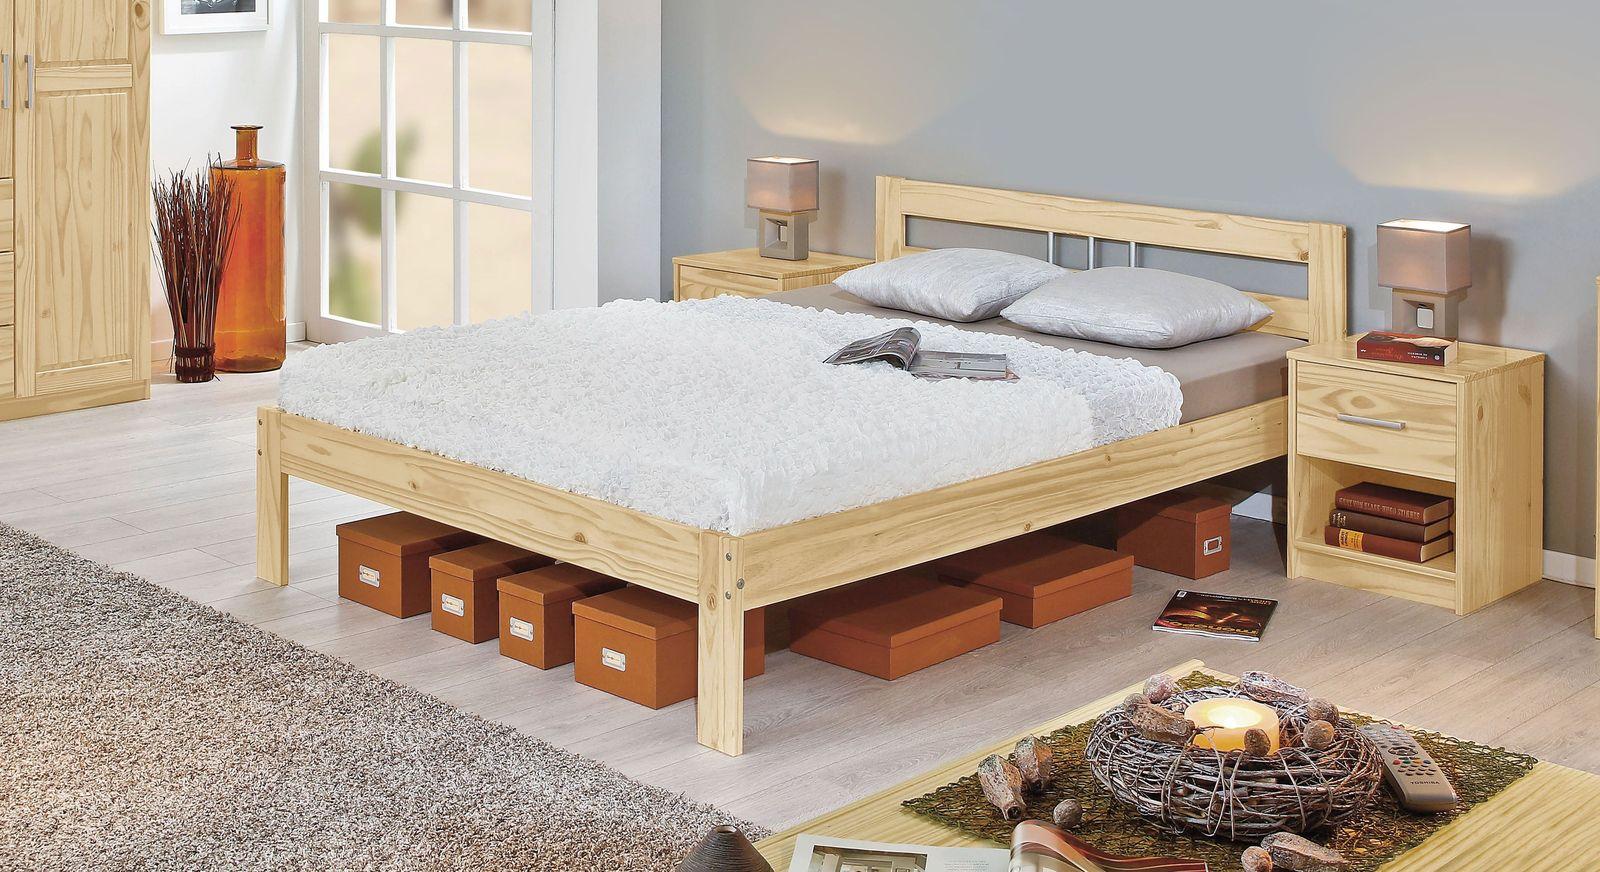 Full Size of Jugend Betten Gnstiges Massivholzbett In Kiefer Natur Lackiert Bregenz Aus Holz Teenager Außergewöhnliche Nolte 140x200 Weiß Ausgefallene Ikea 160x200 Bei Bett Jugend Betten